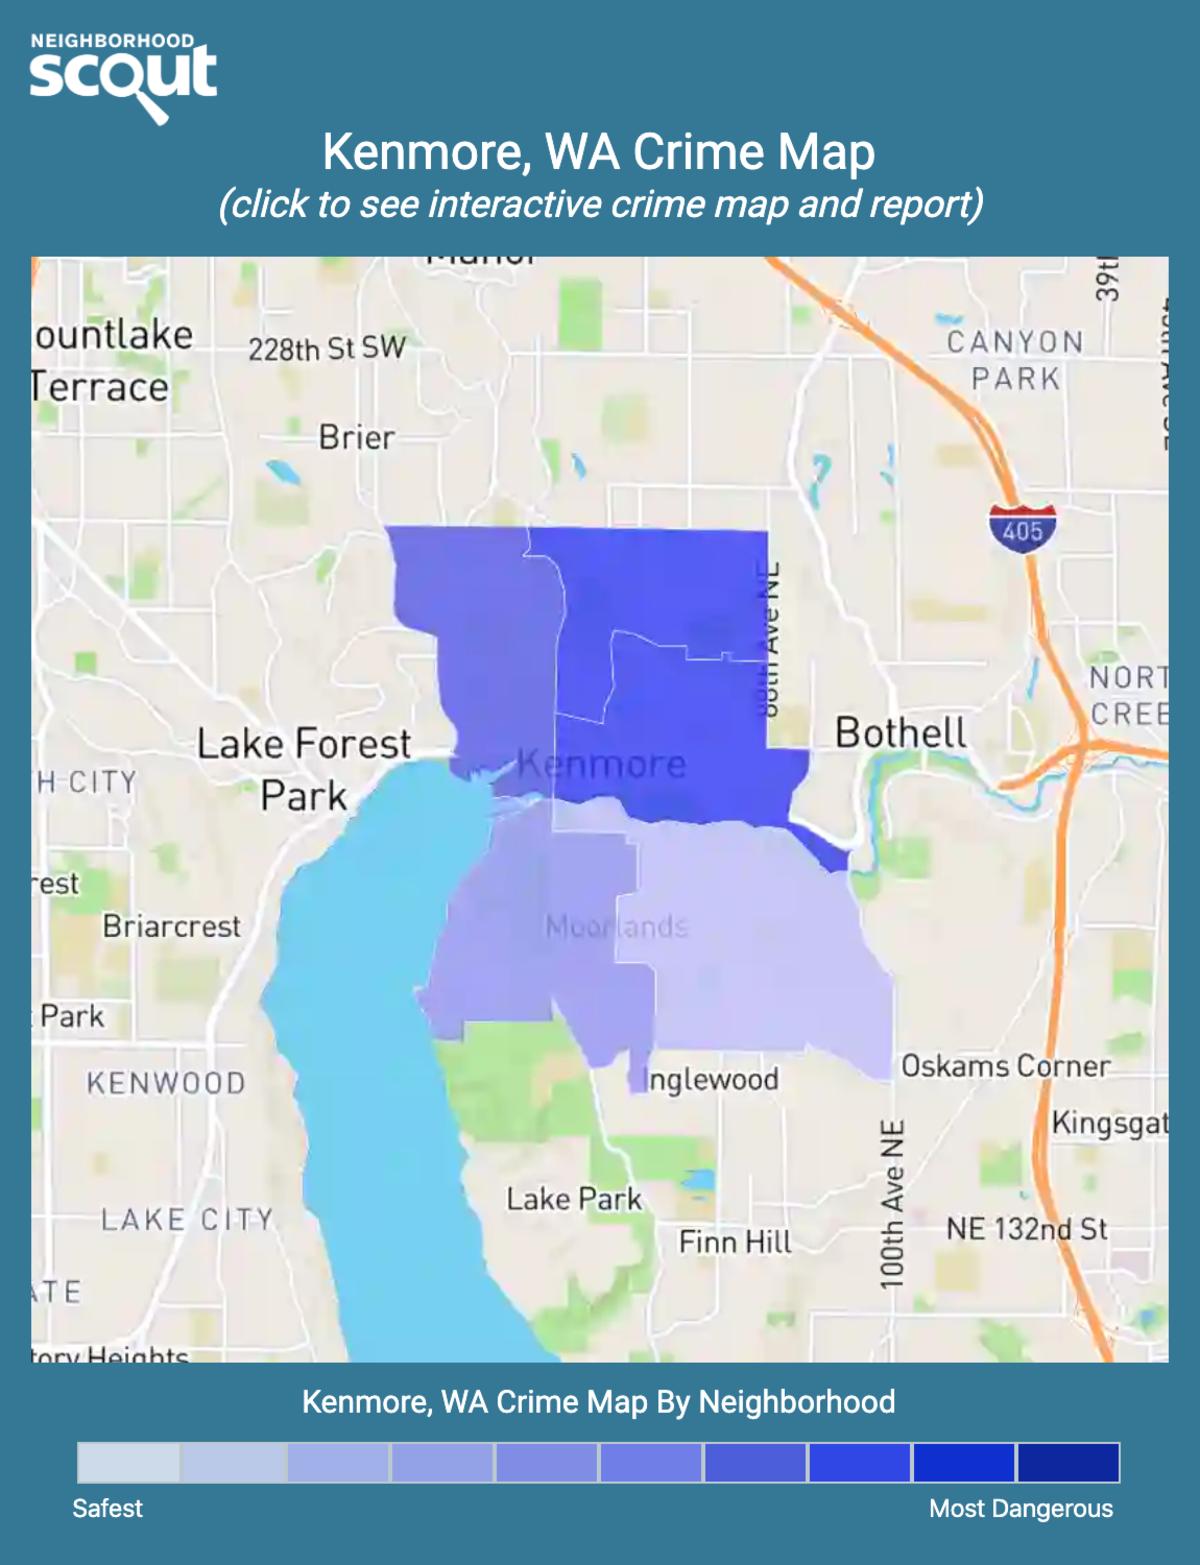 Kenmore, Washington crime map